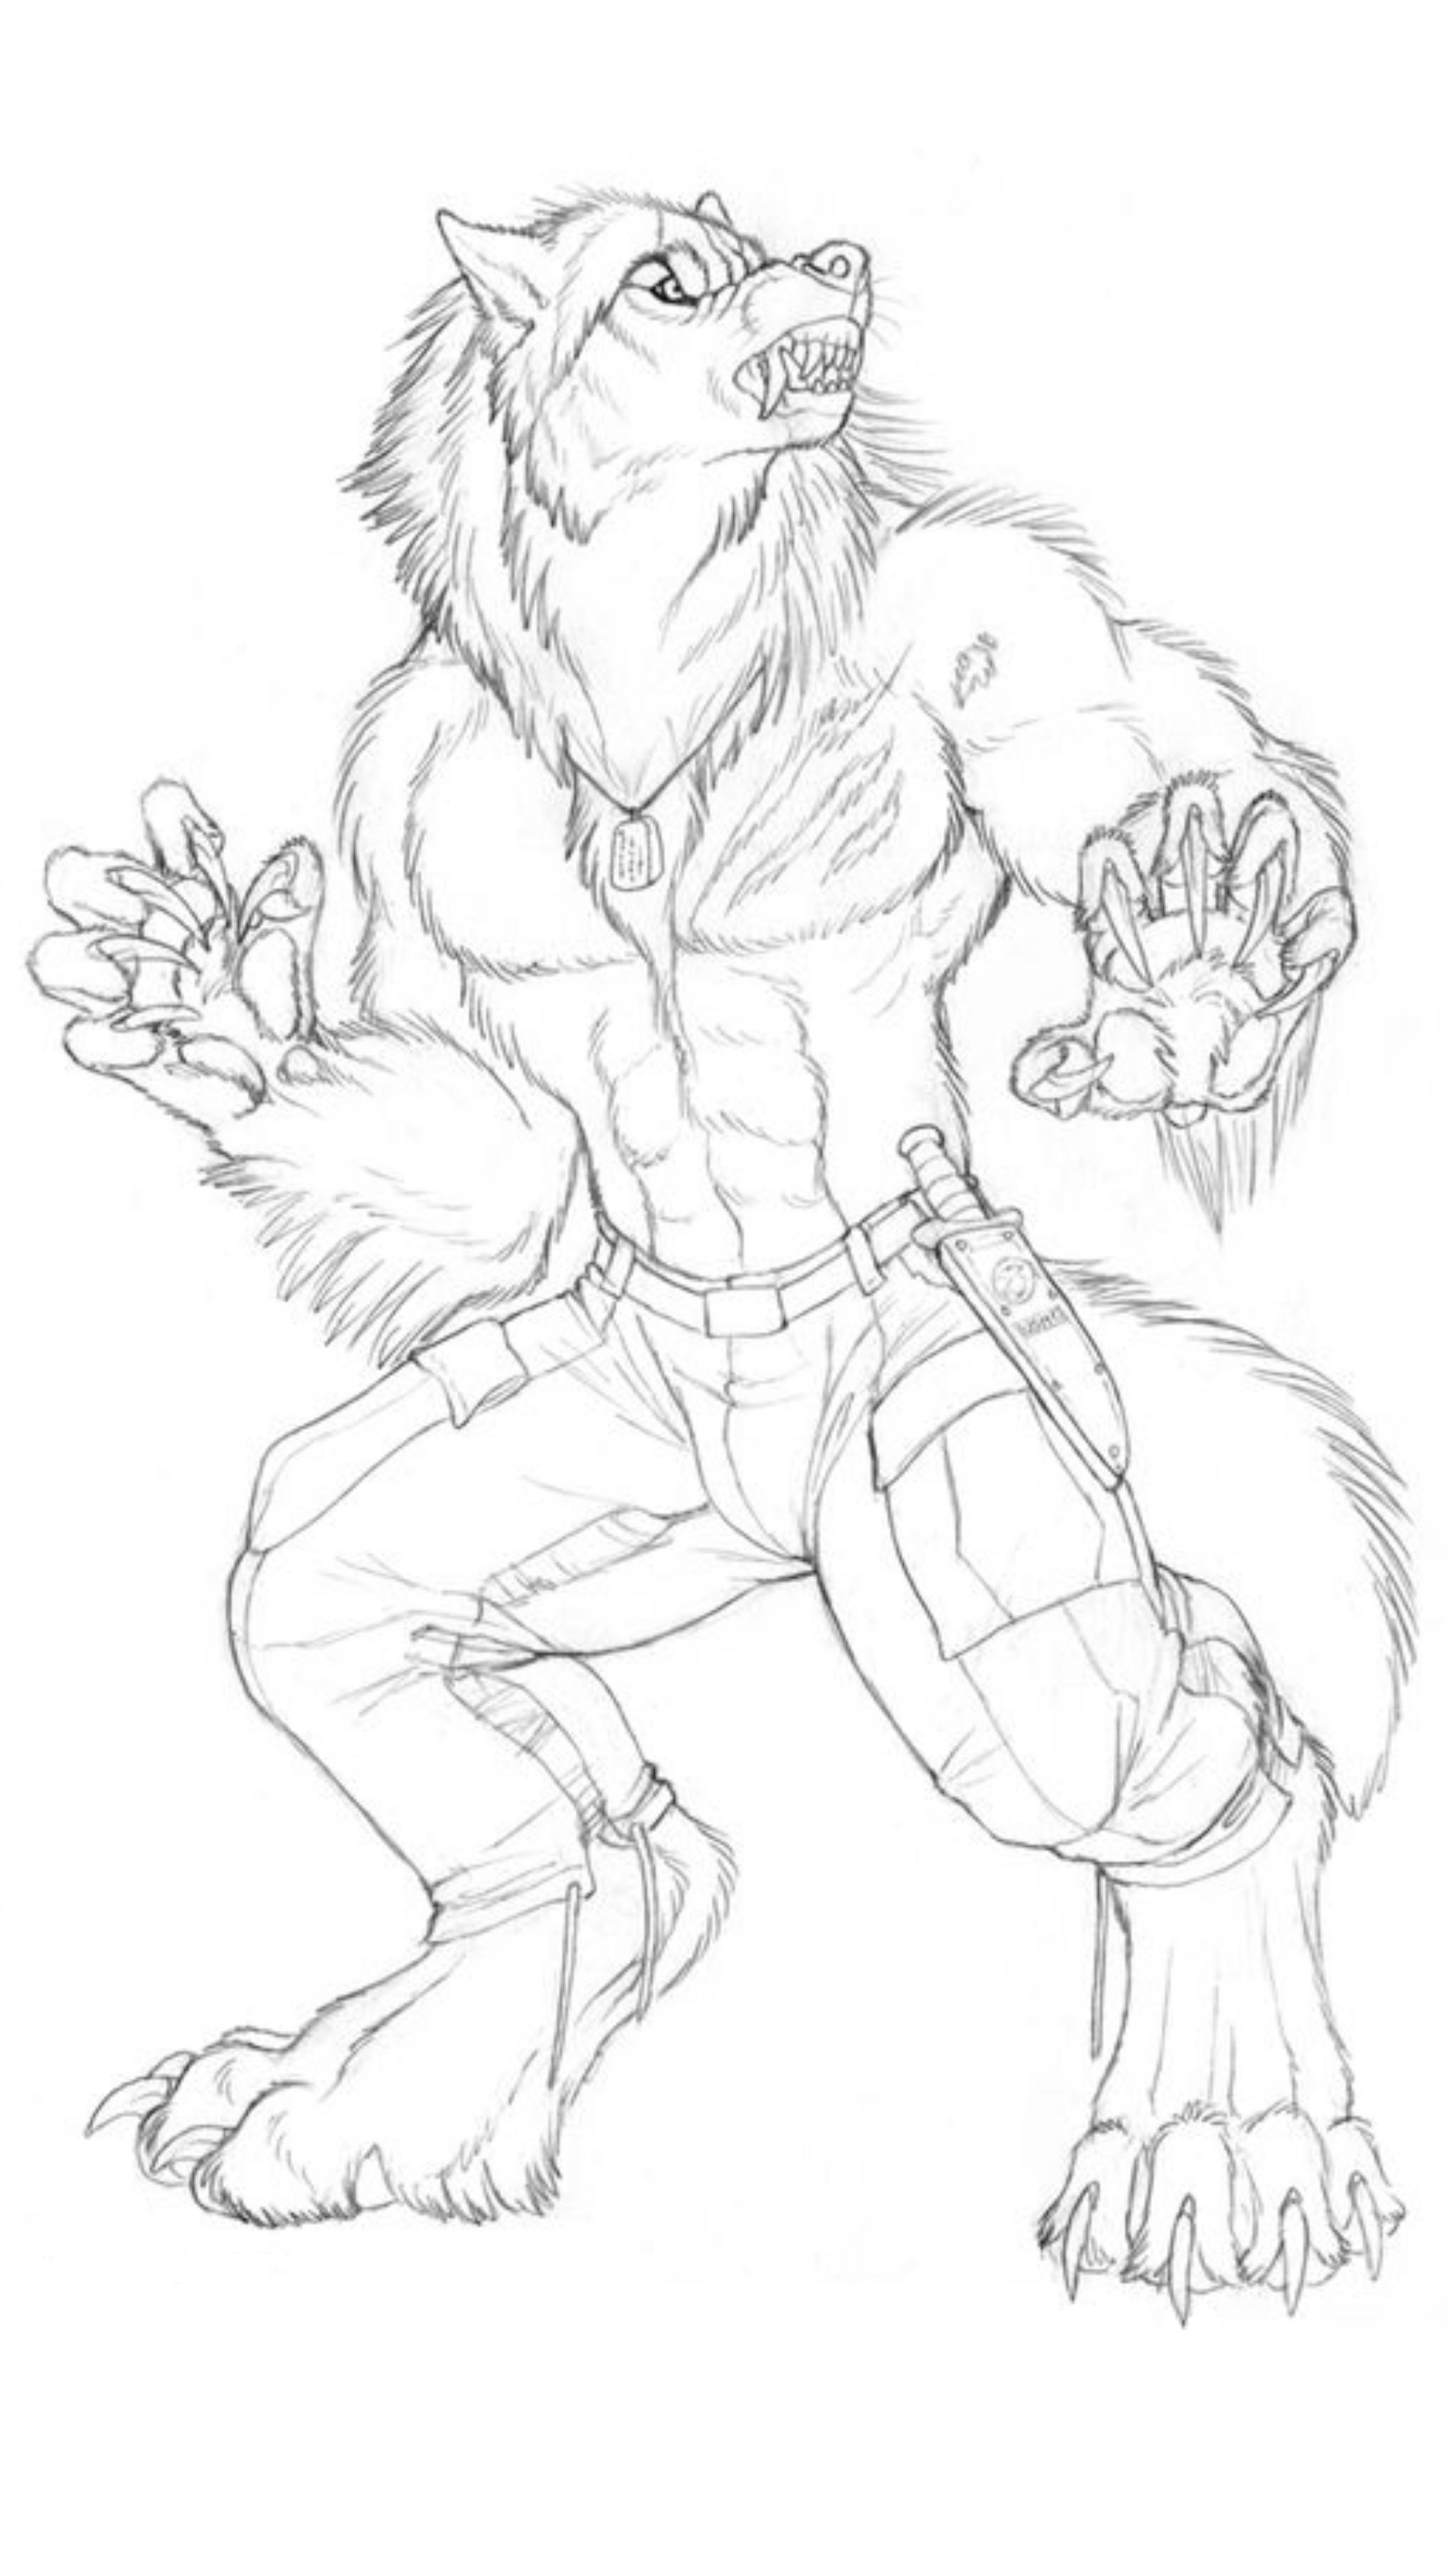 2160x3840 Werewolf Rysunki Werewolves, Wolf And Drawings